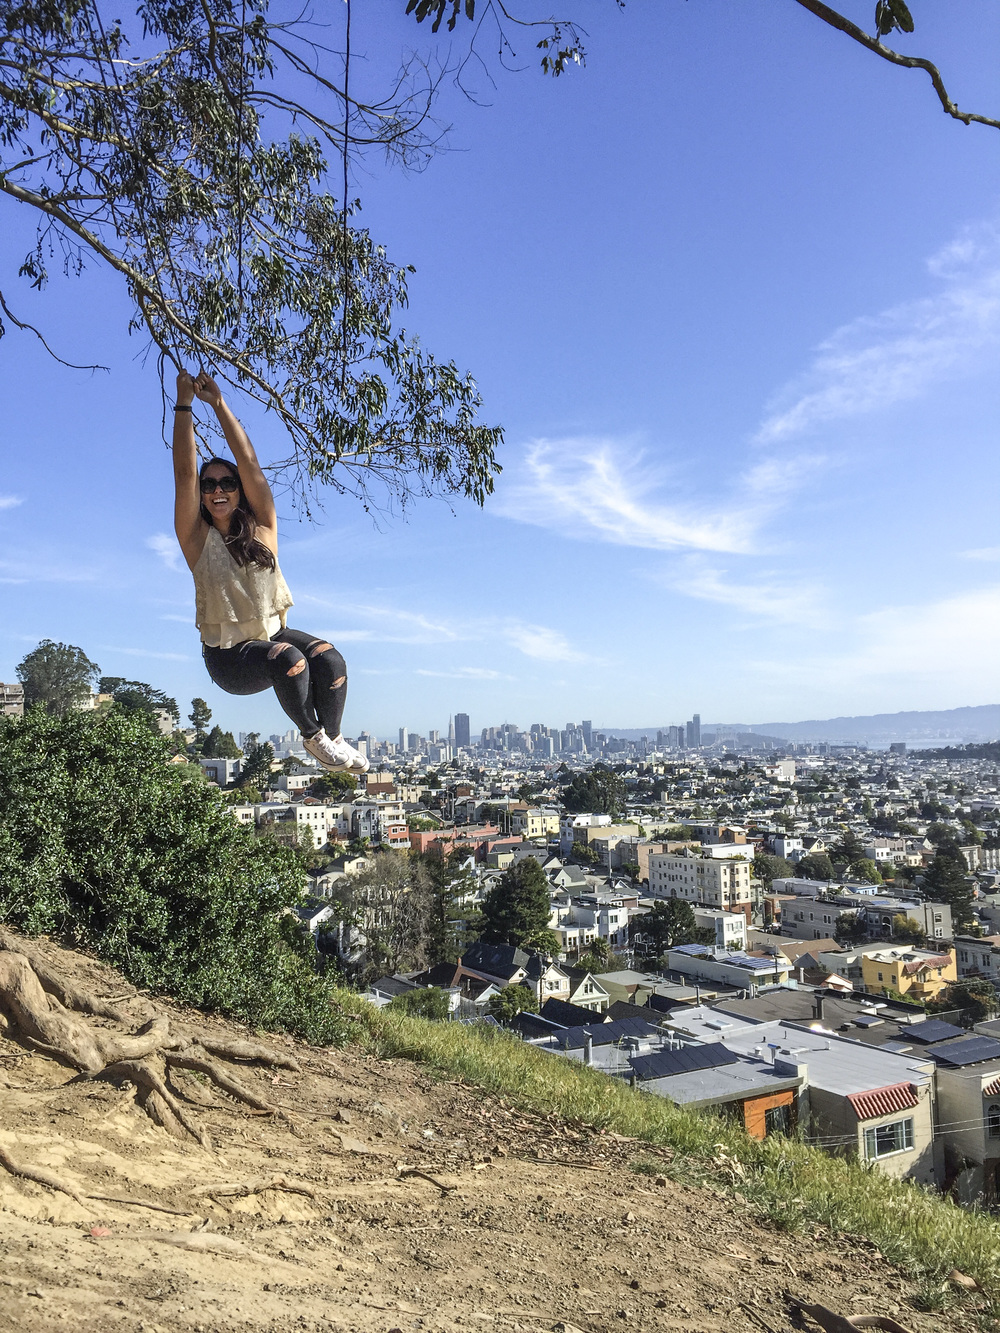 San_Francisco_Billy_Goat_Hill_Park_3